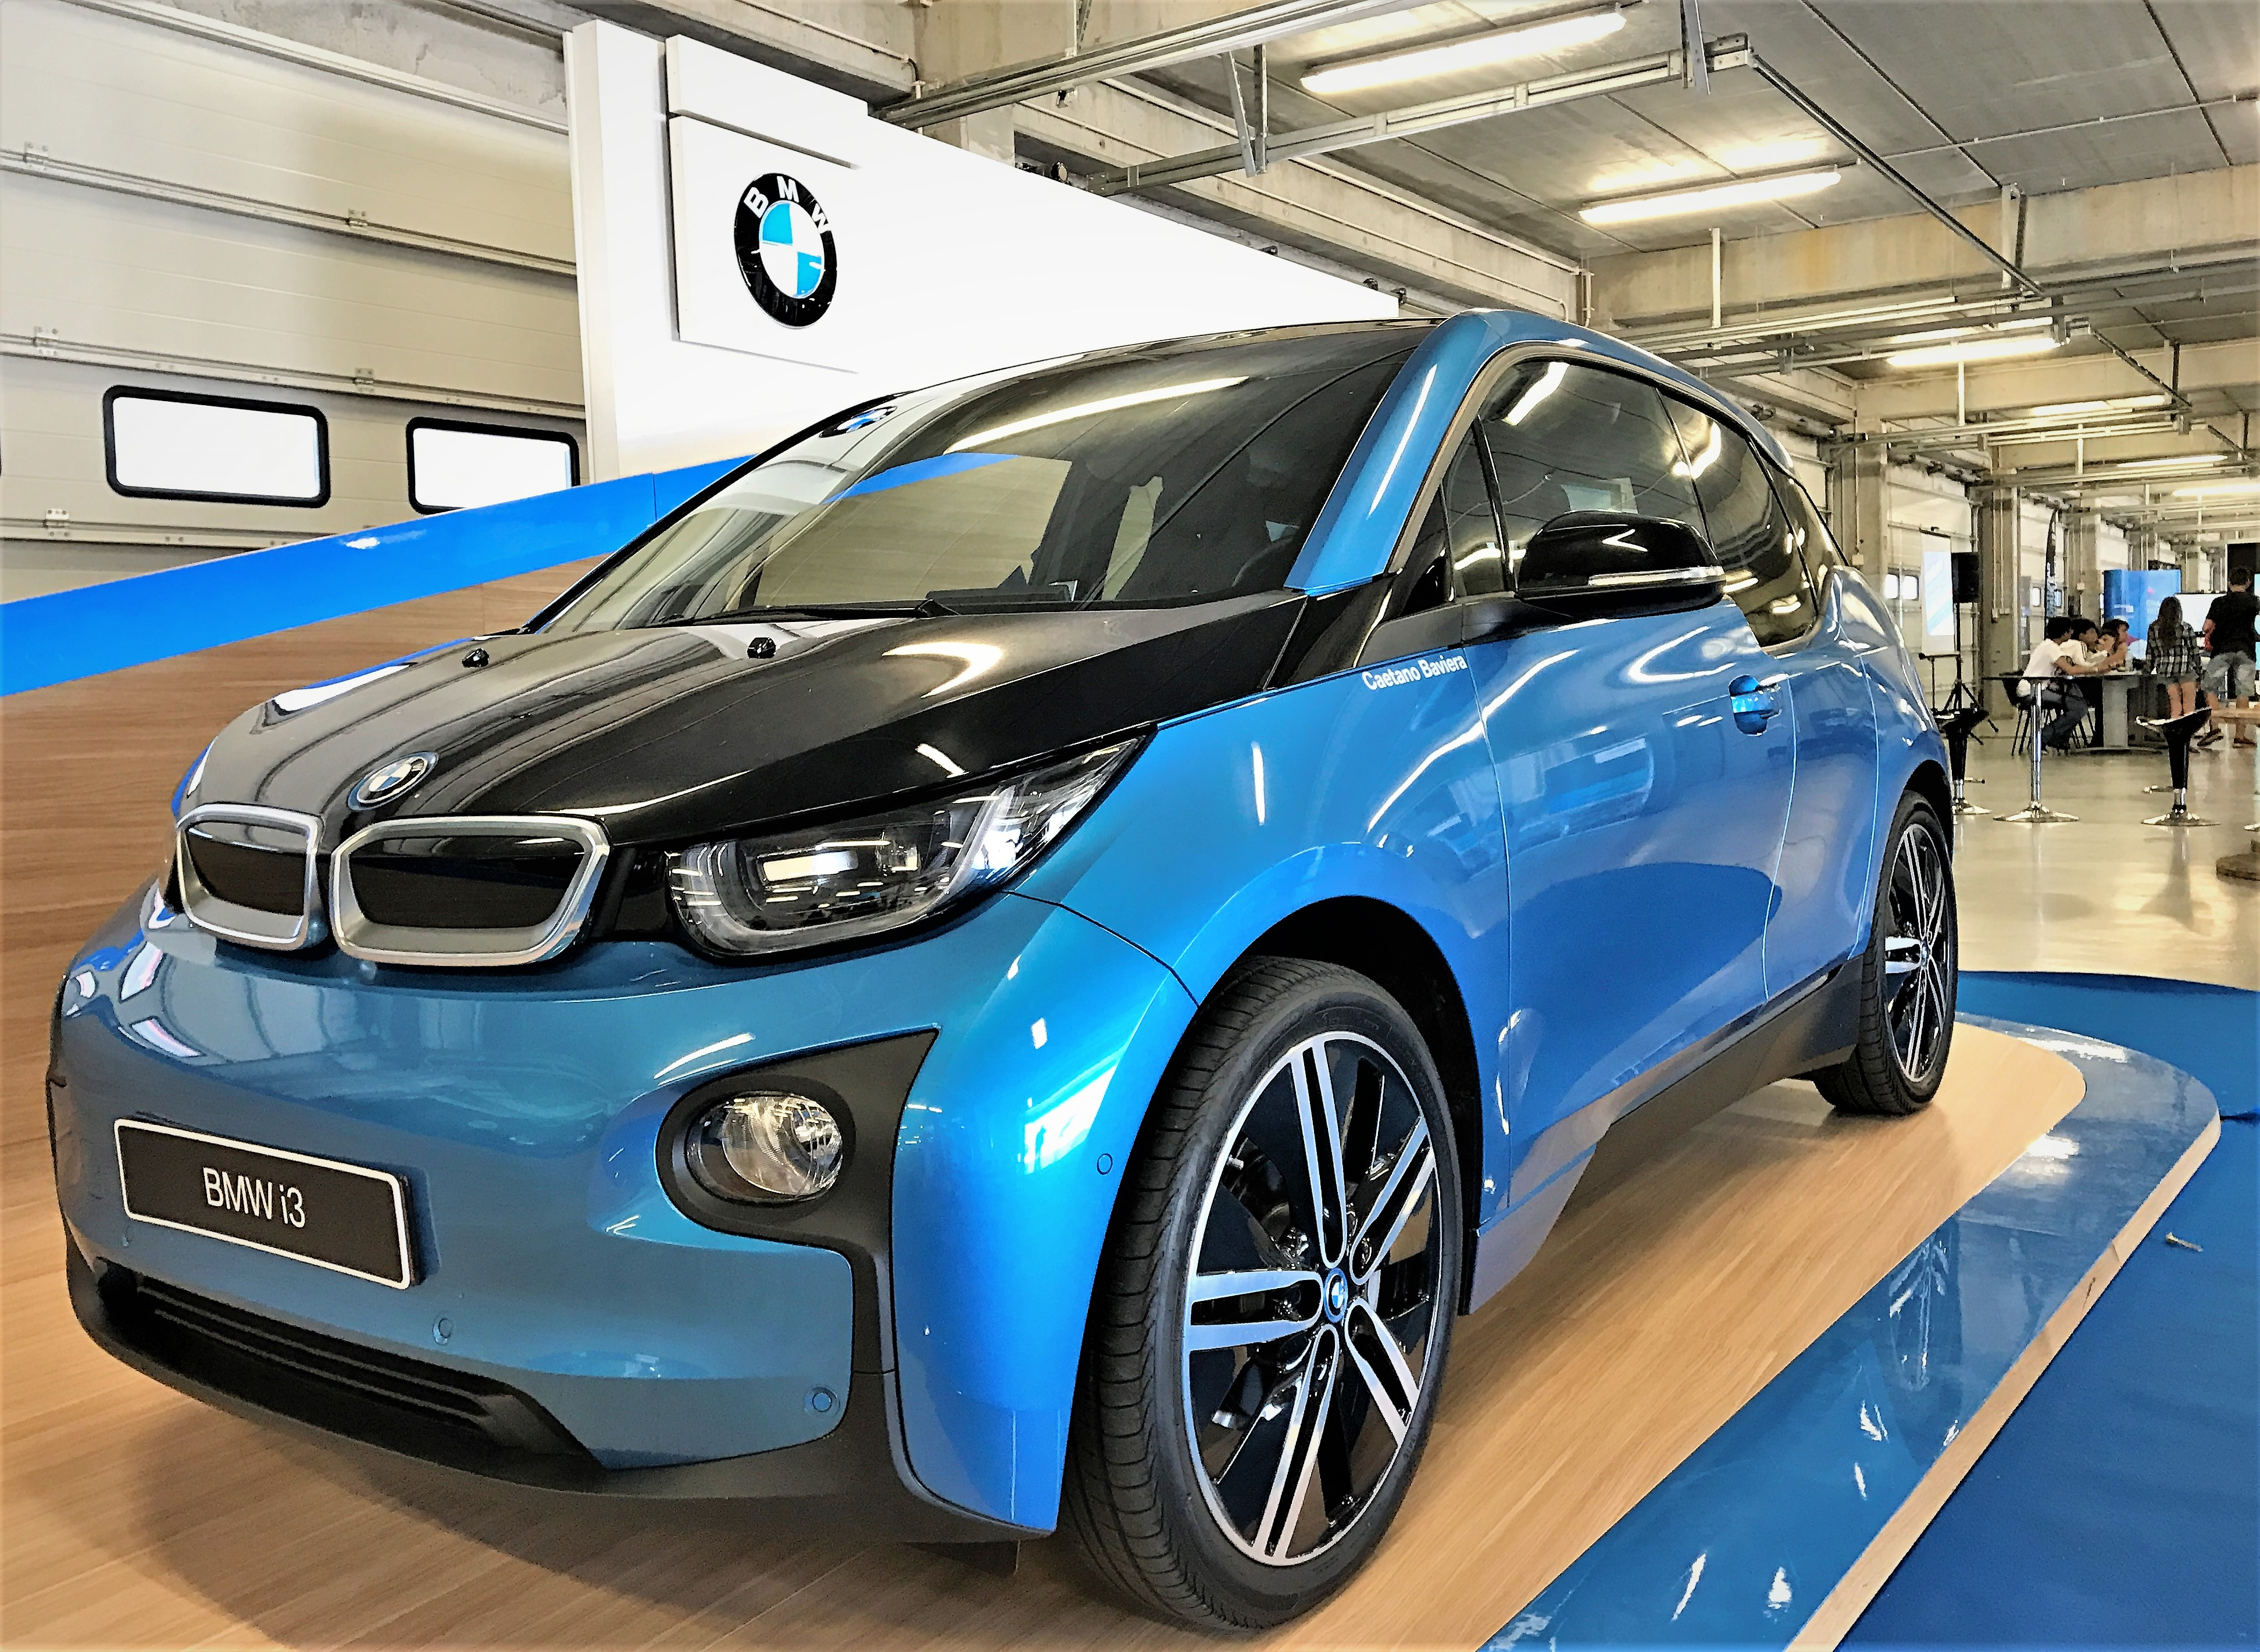 BMWi3 auf Smart Region Summit in Portimao, Algarve